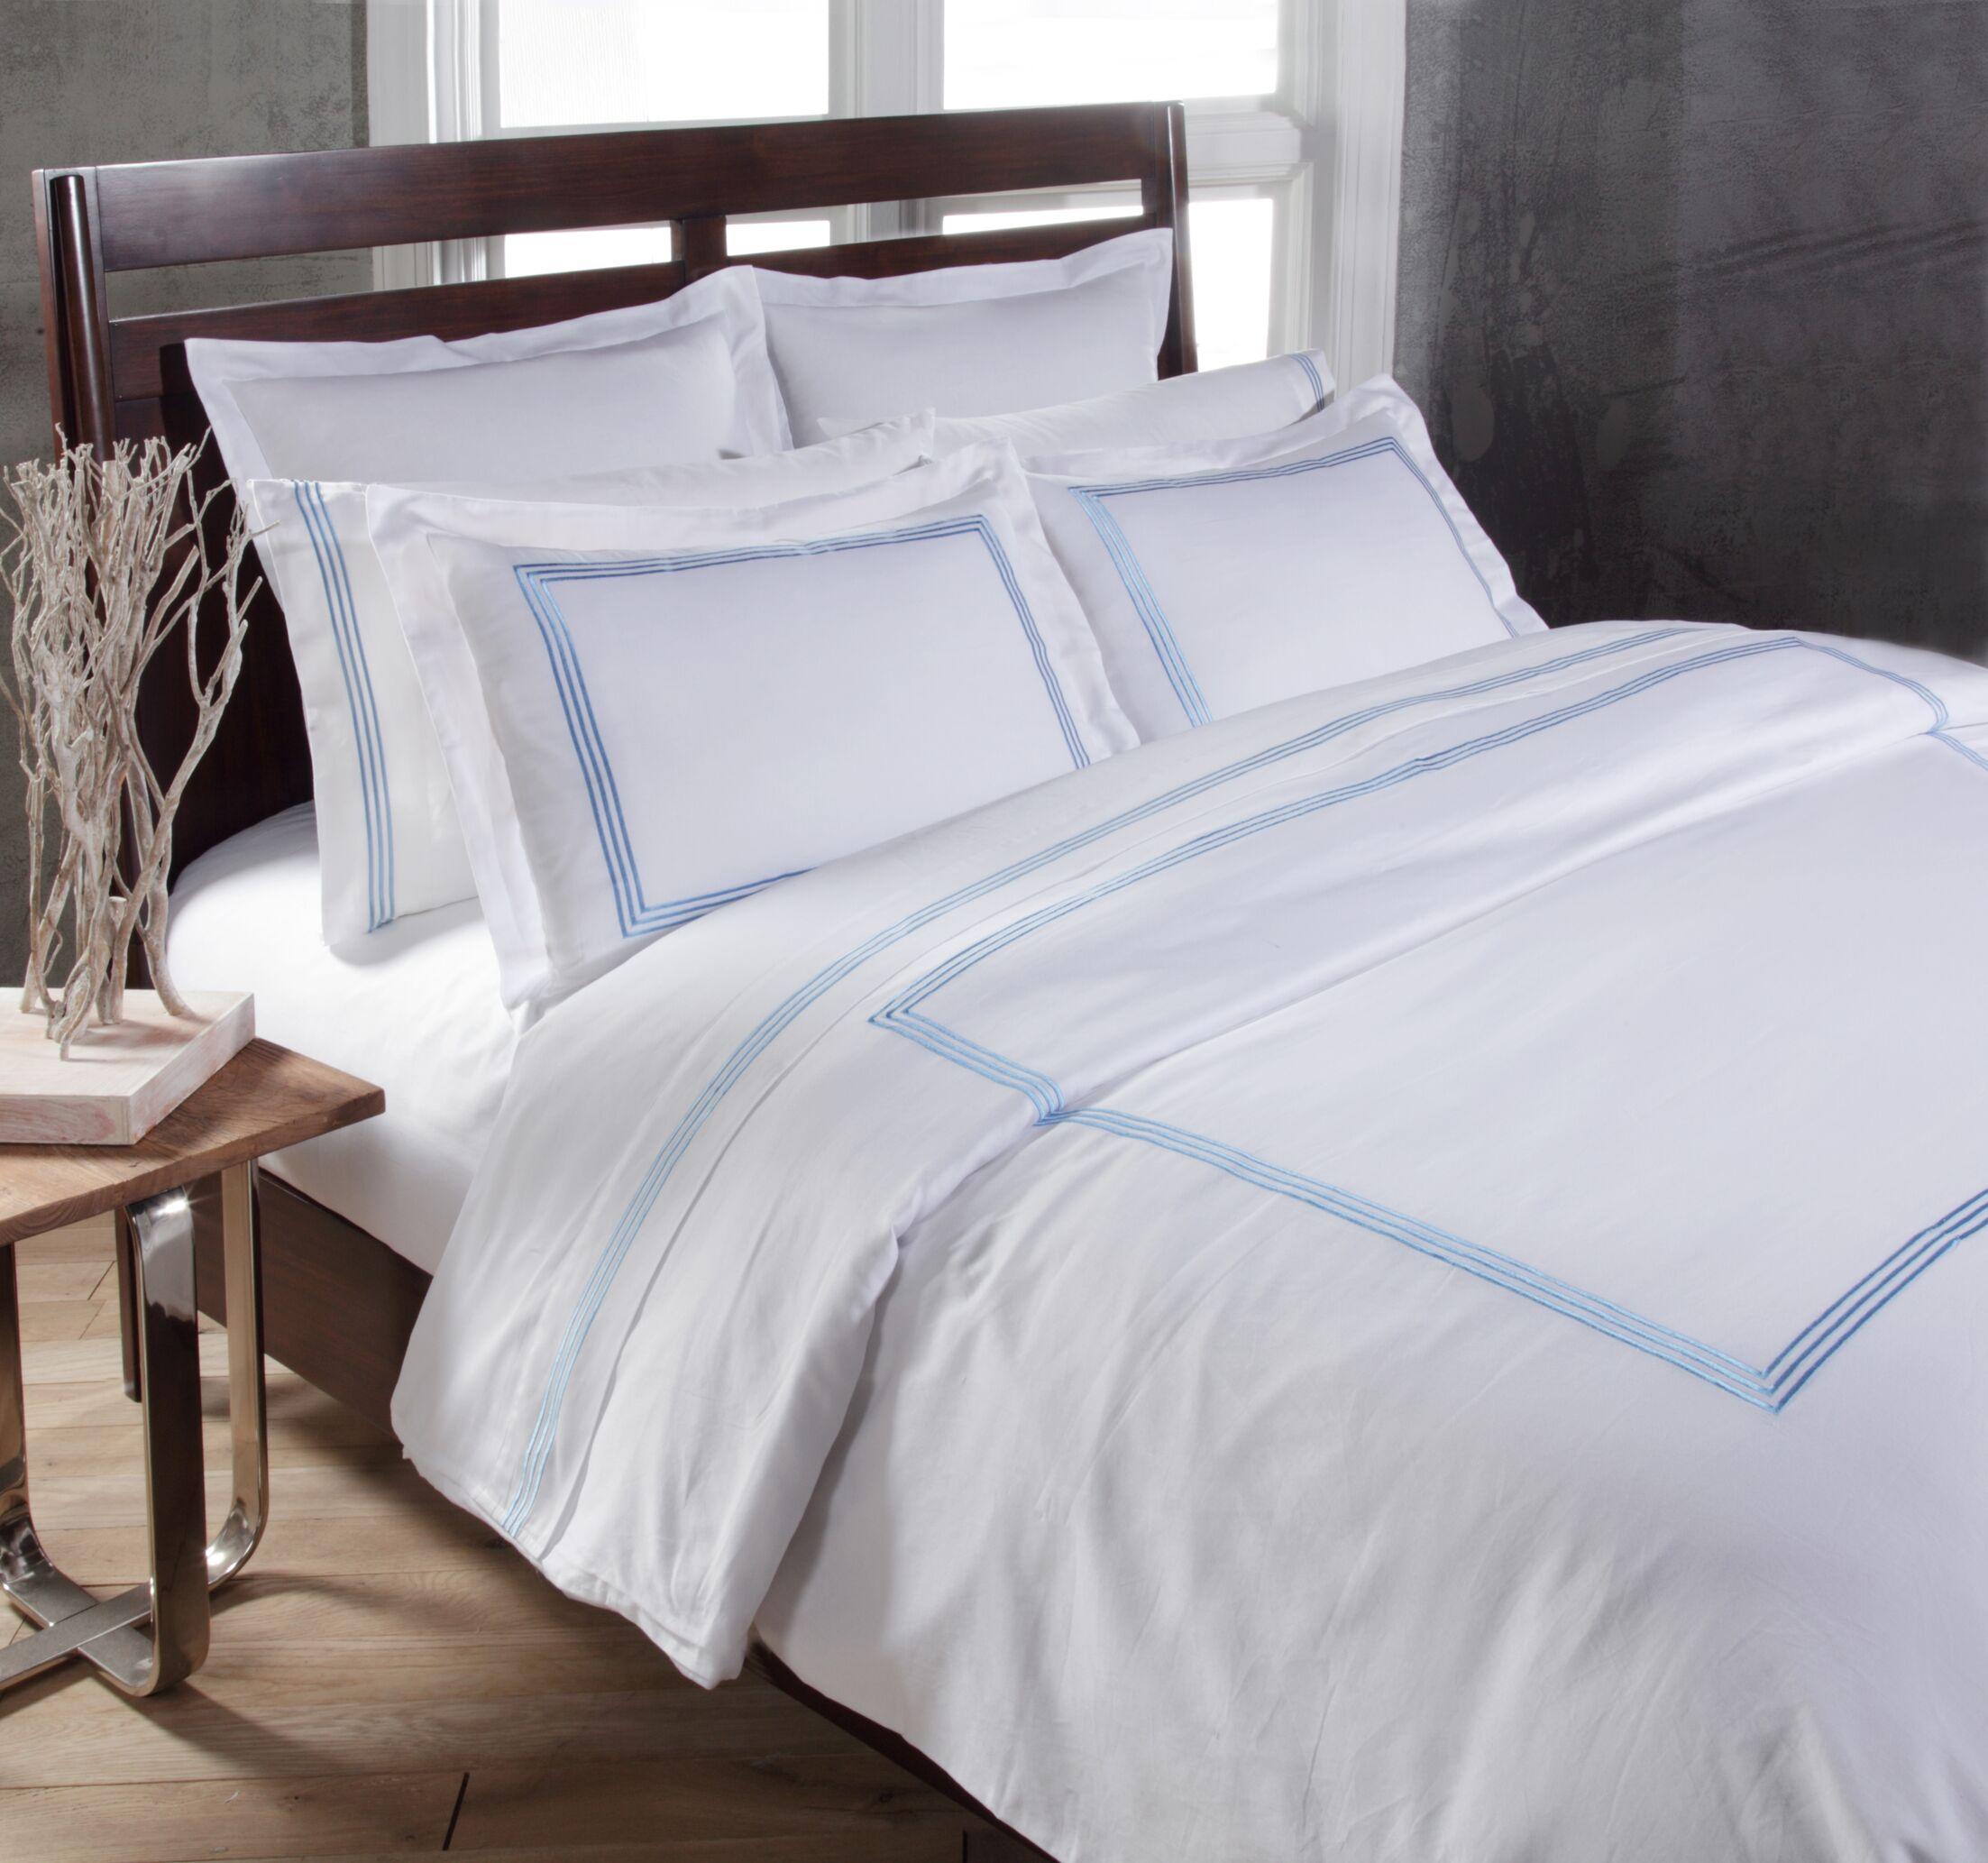 Stowe Sheet Set Color: Blue, Size: King